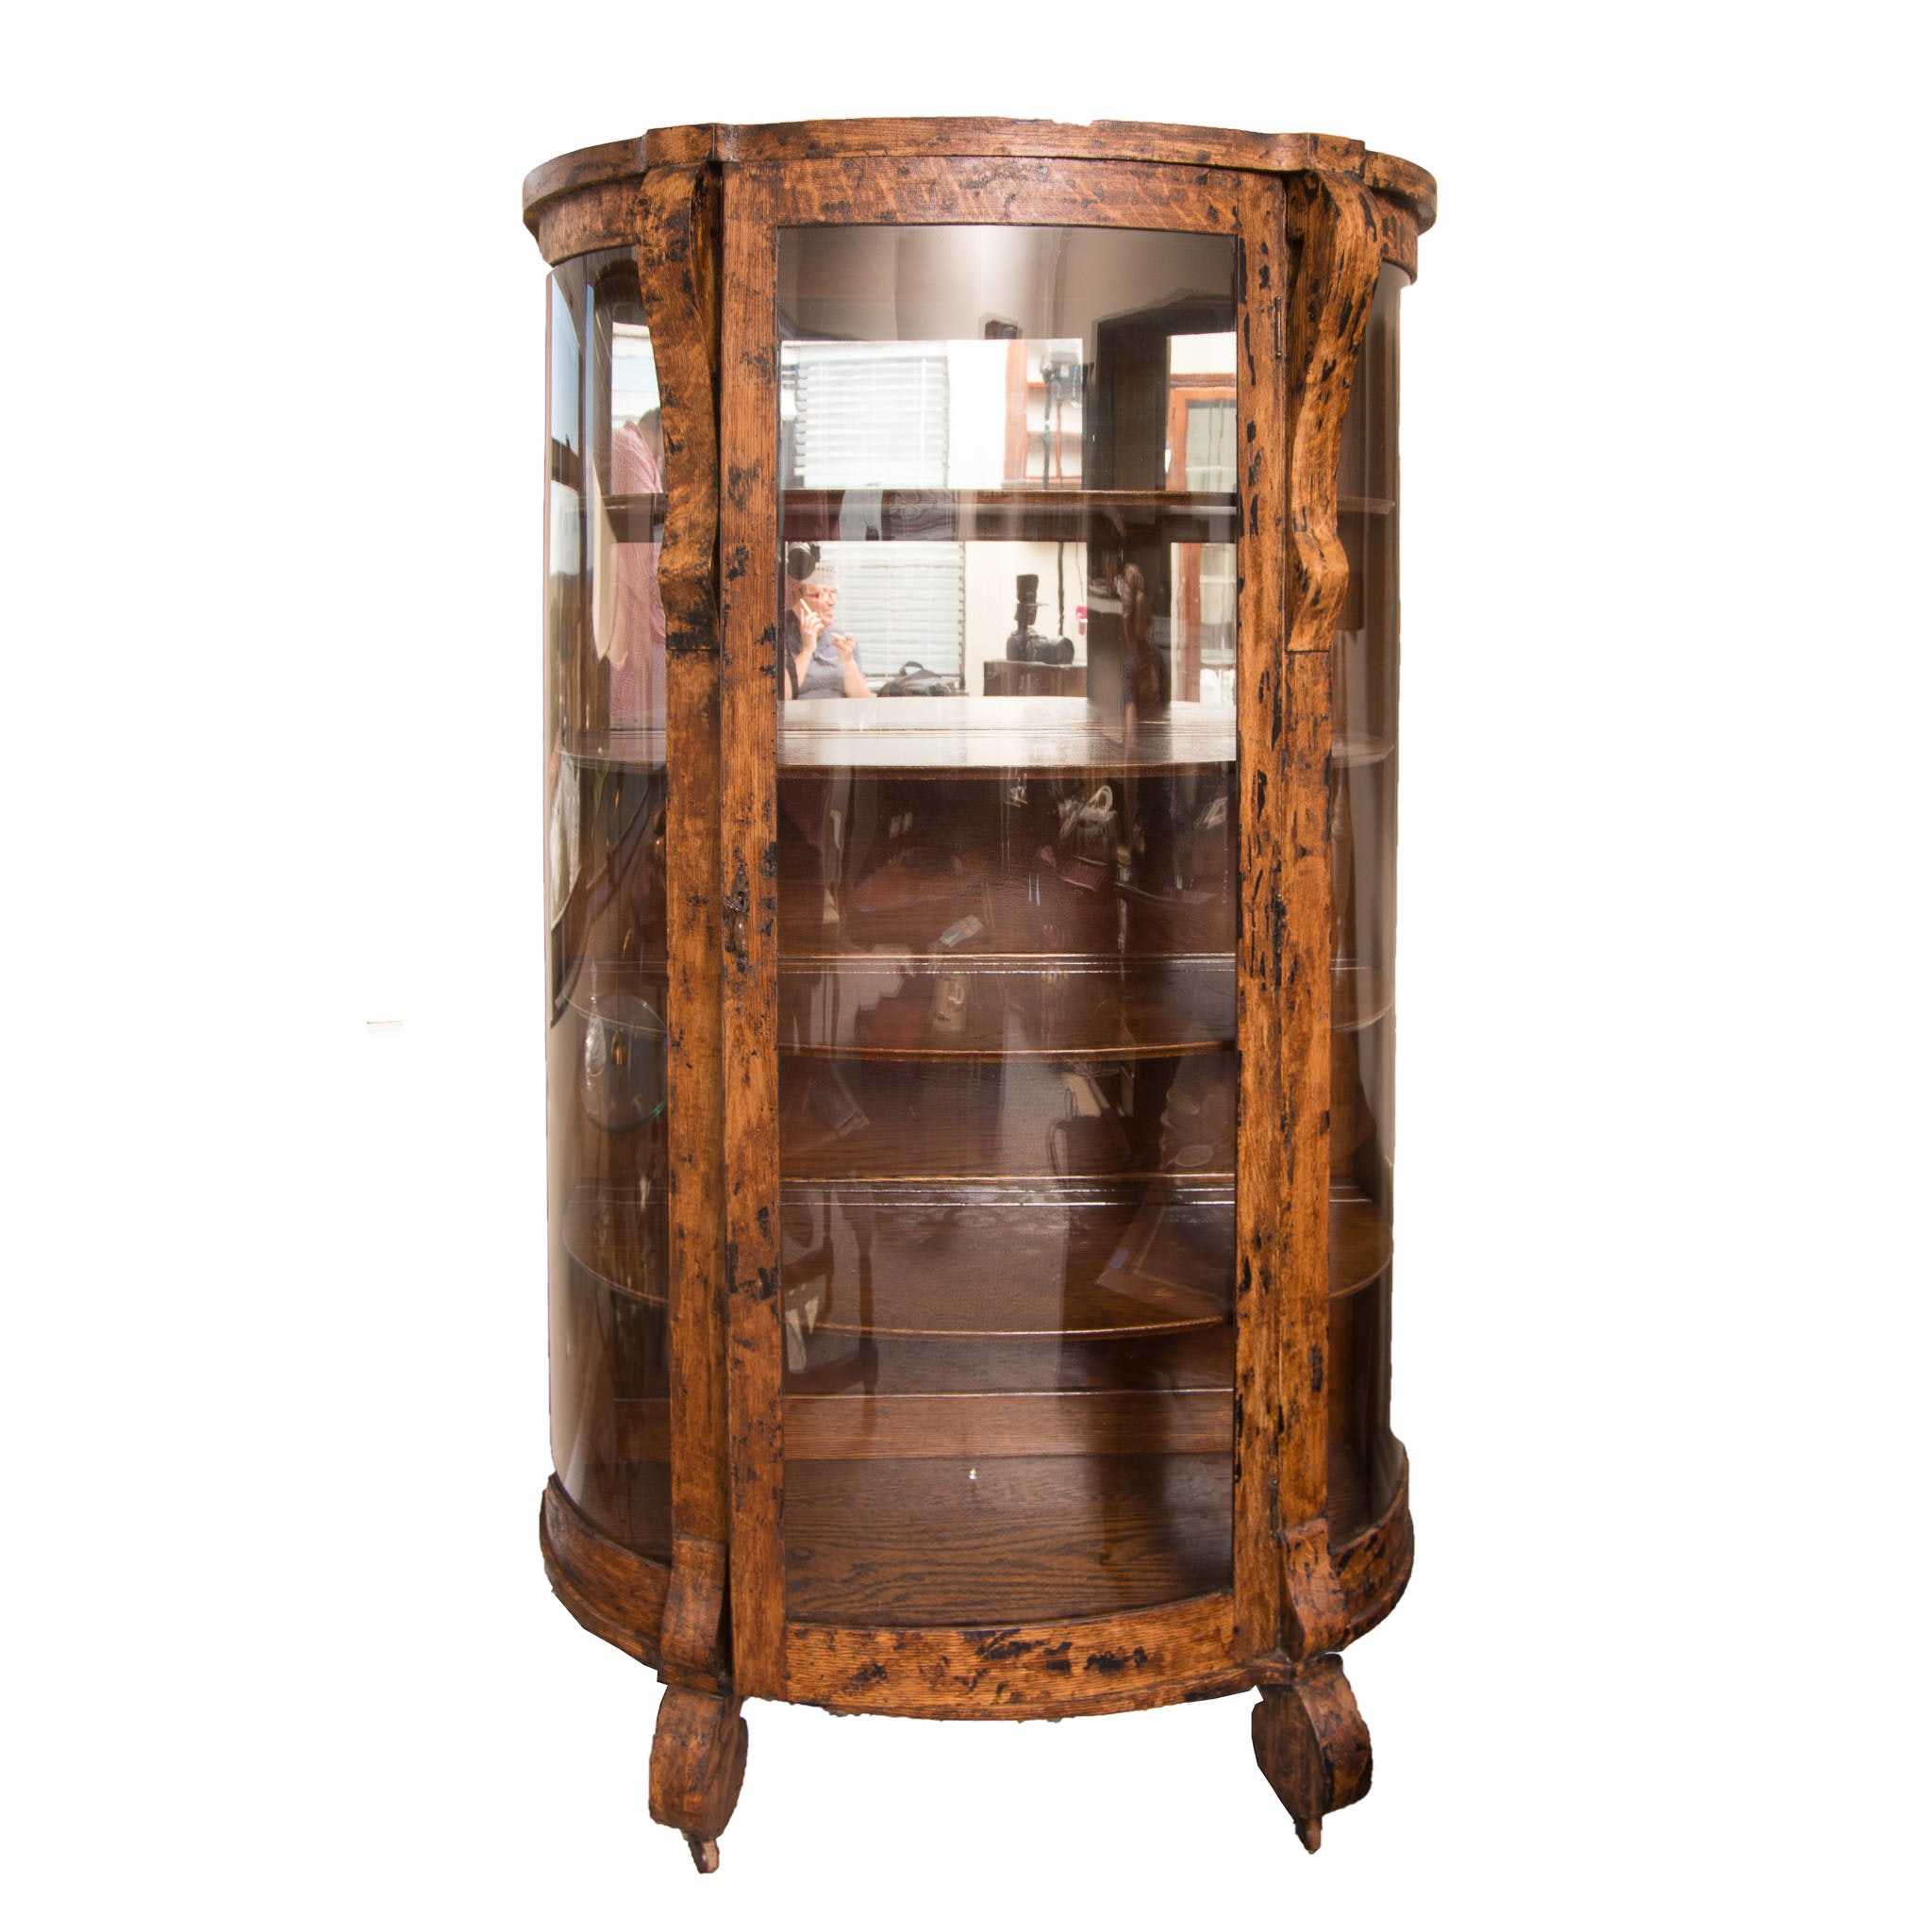 Circa 1900 Oak Bowfront Display Cabinet